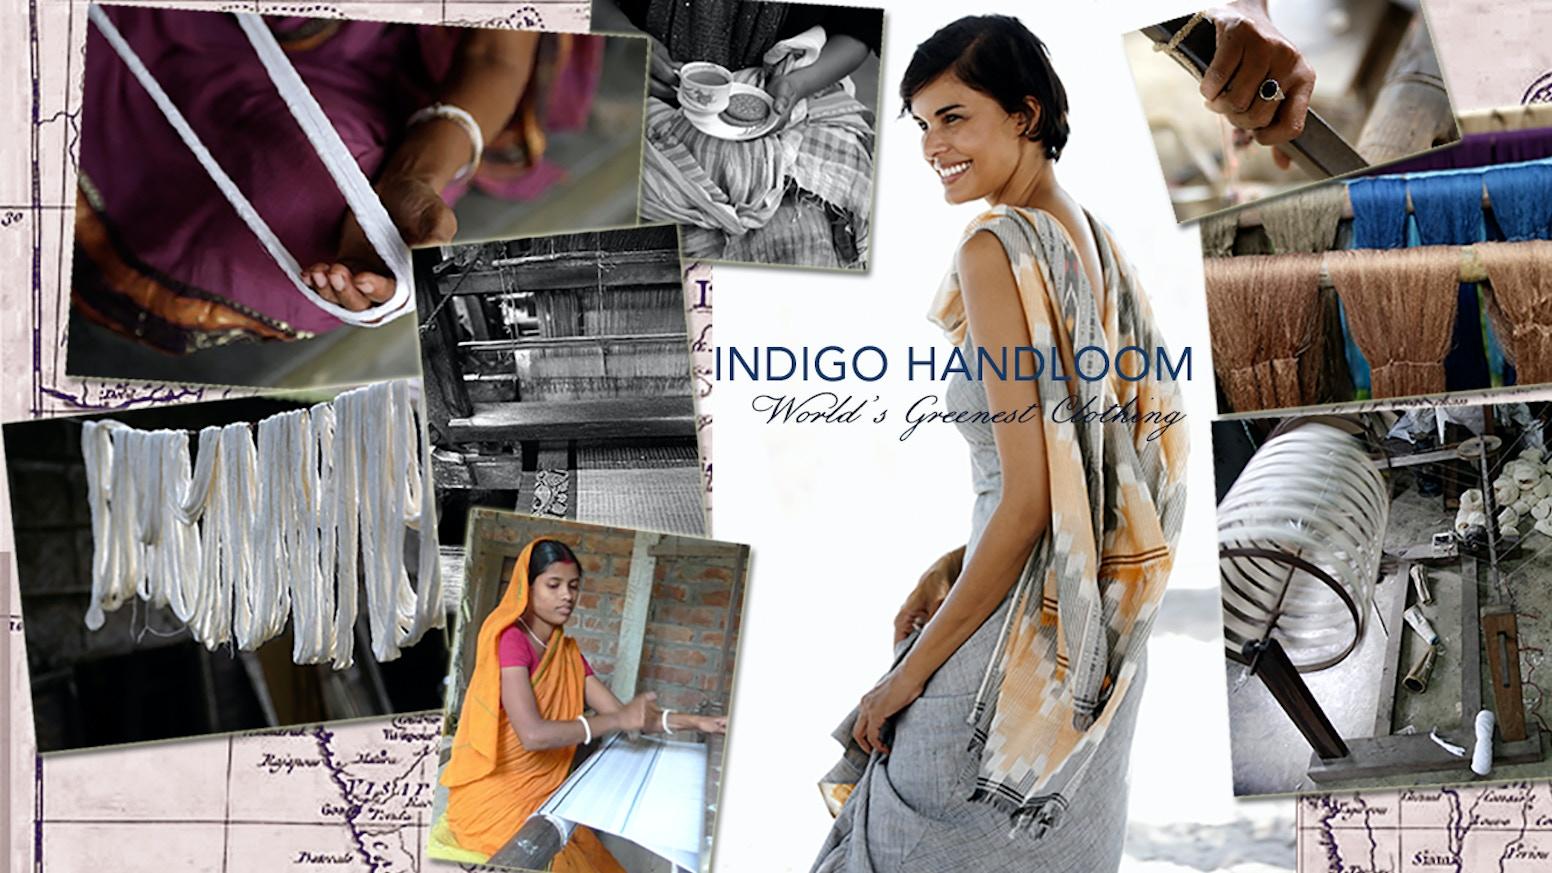 World's Greenest Clothing by Indigo Handloom Inc  — Kickstarter